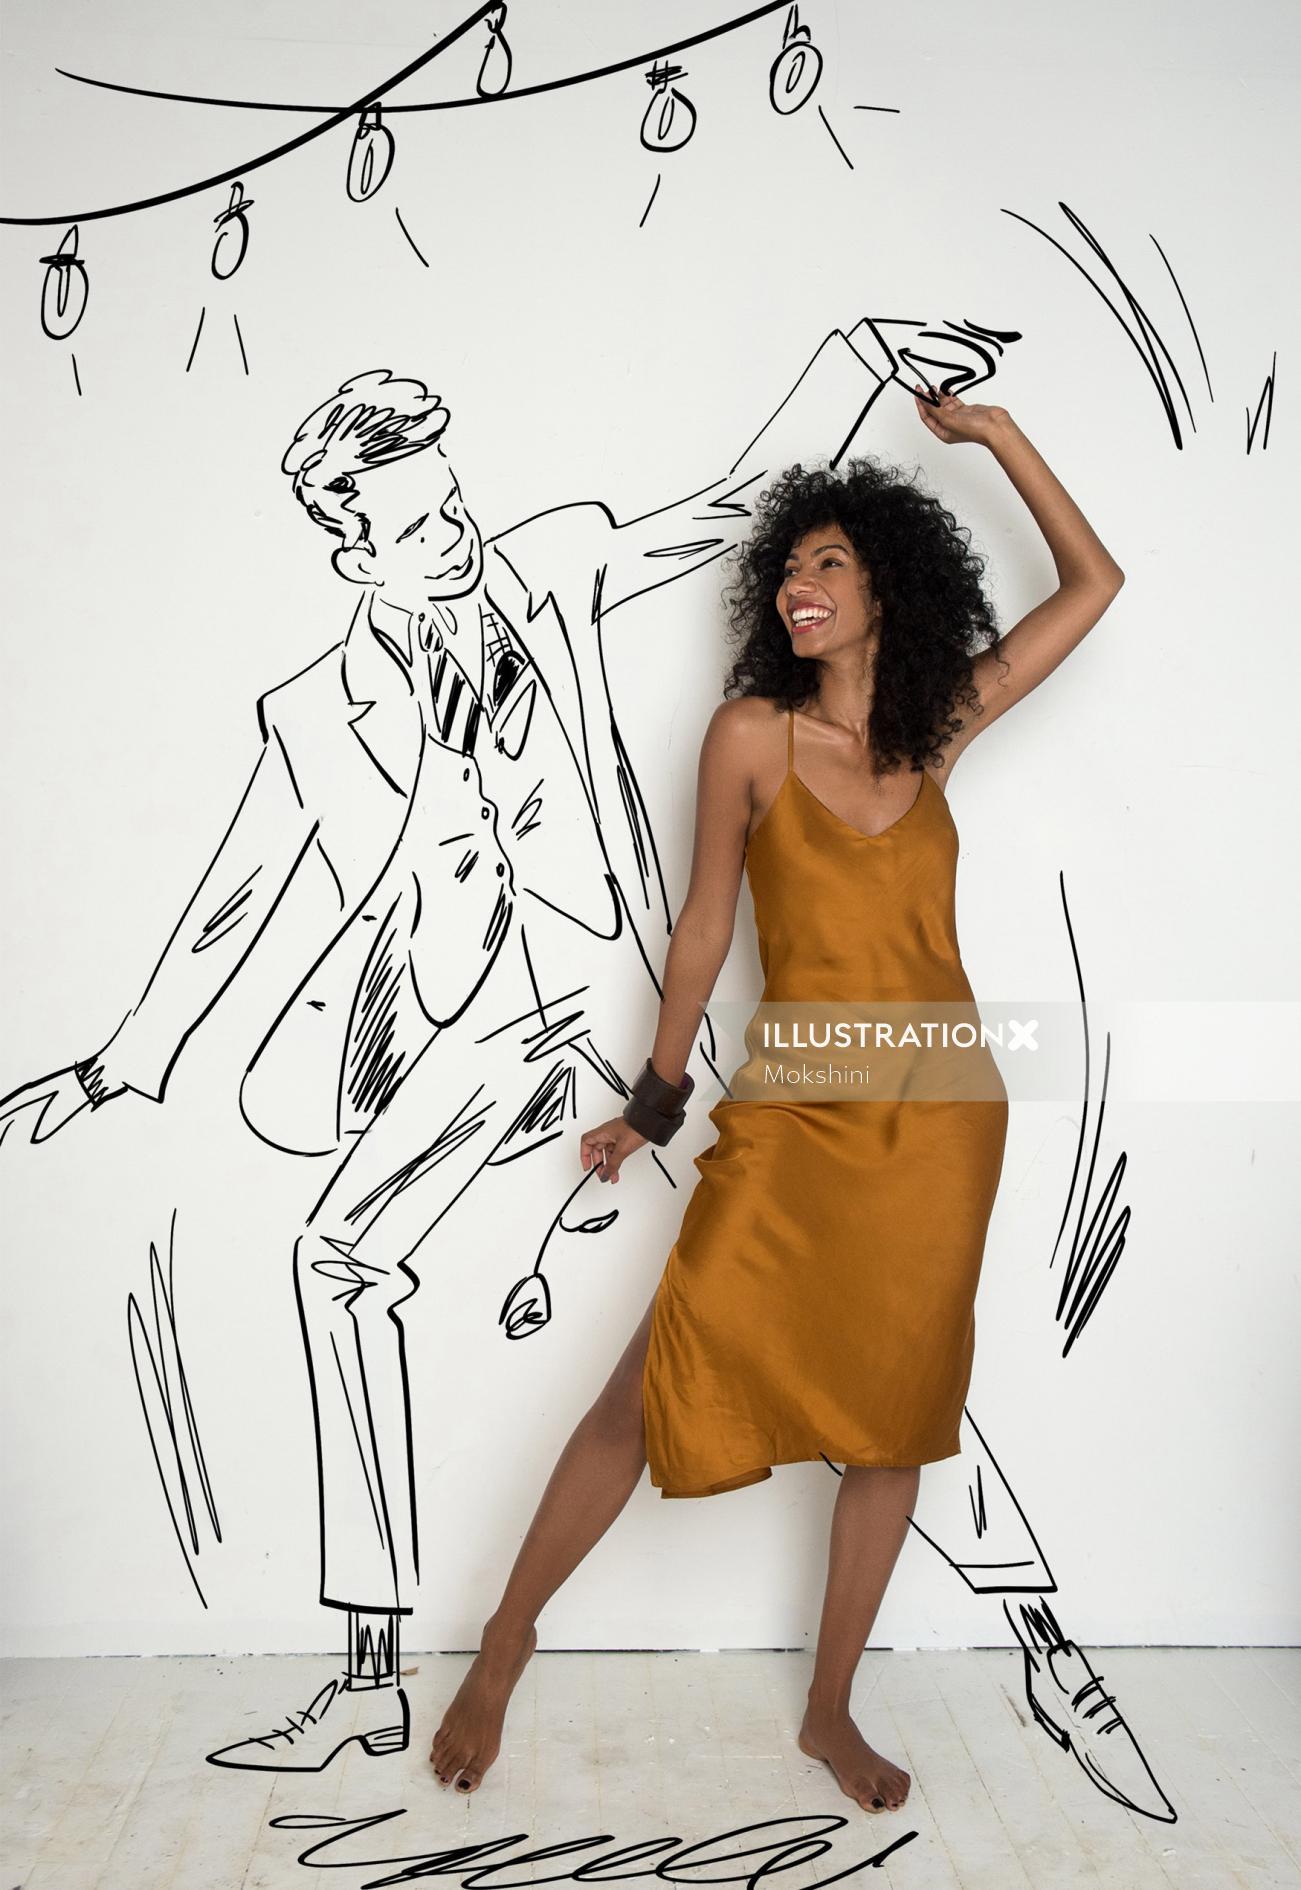 Live drawing of Mr Dreamy by Mokshini